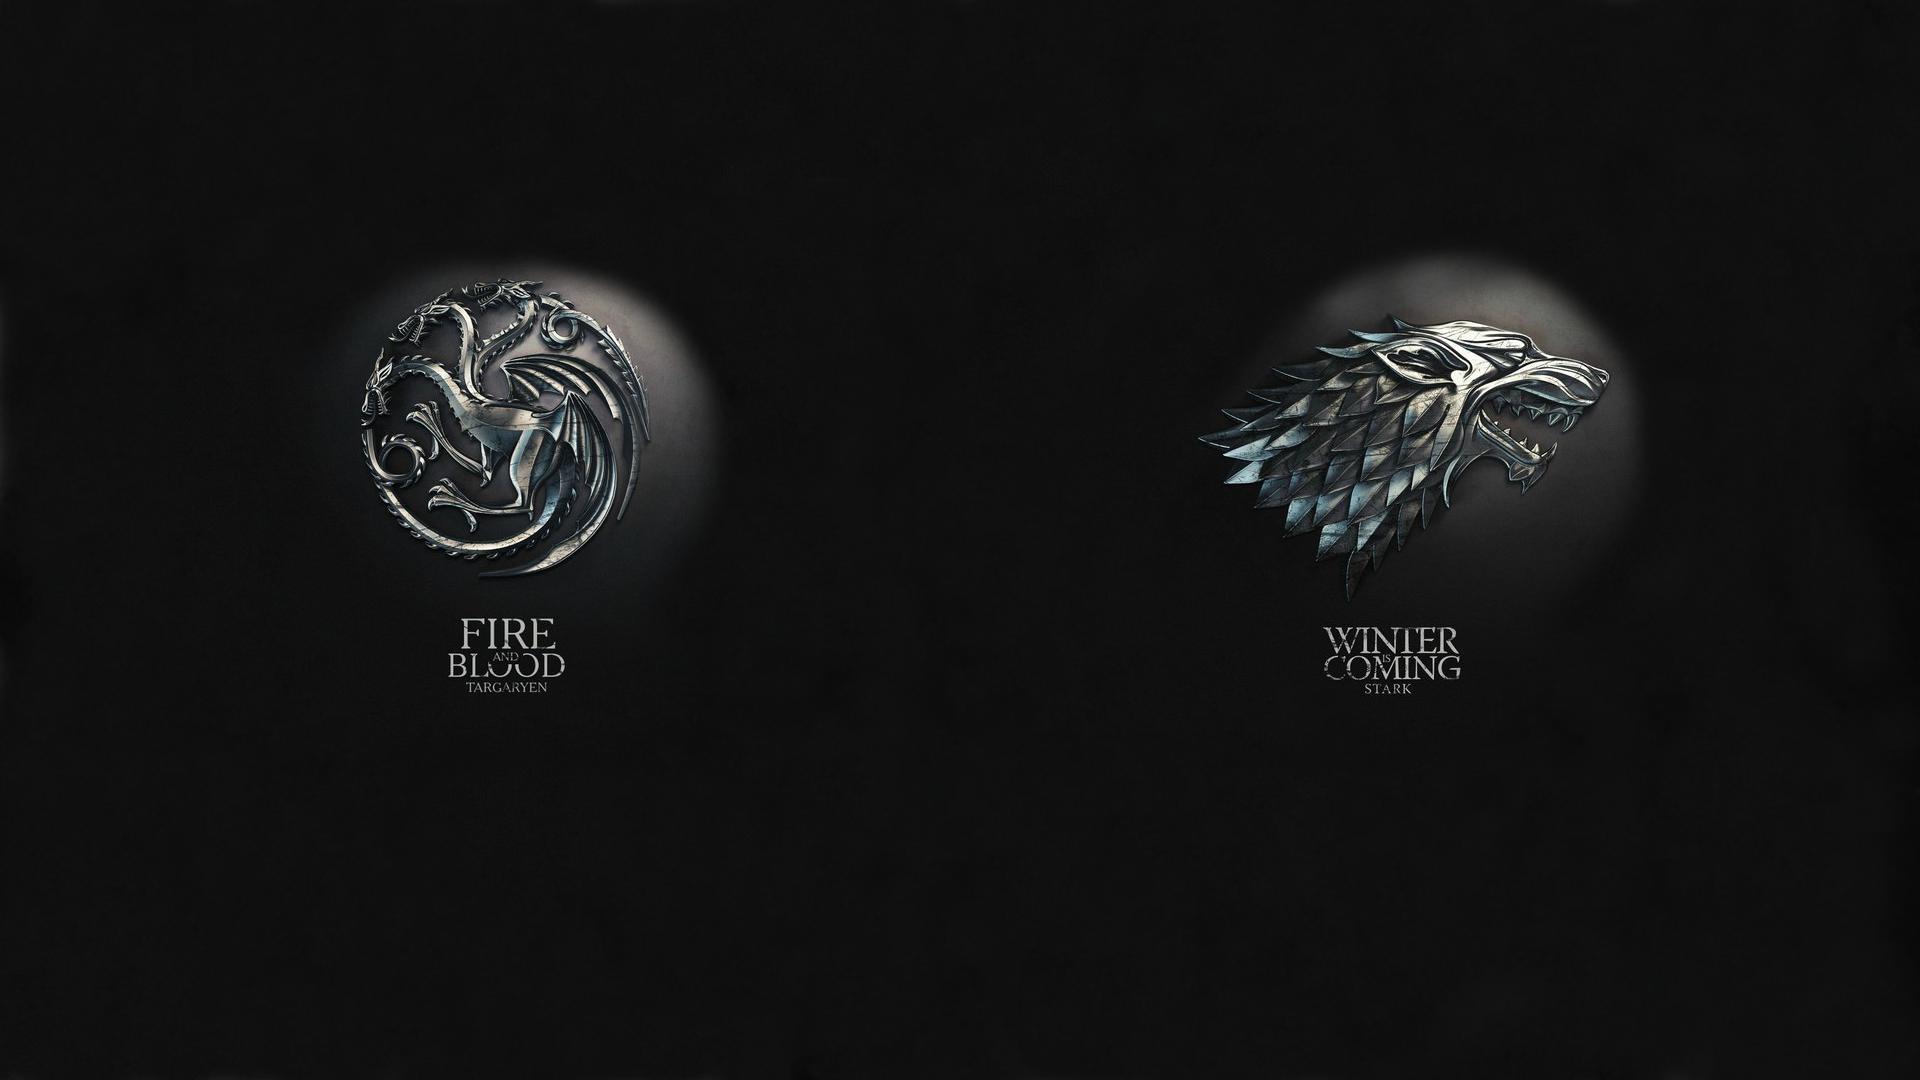 To anyone like me who loves both House Stark and House Targaryen .